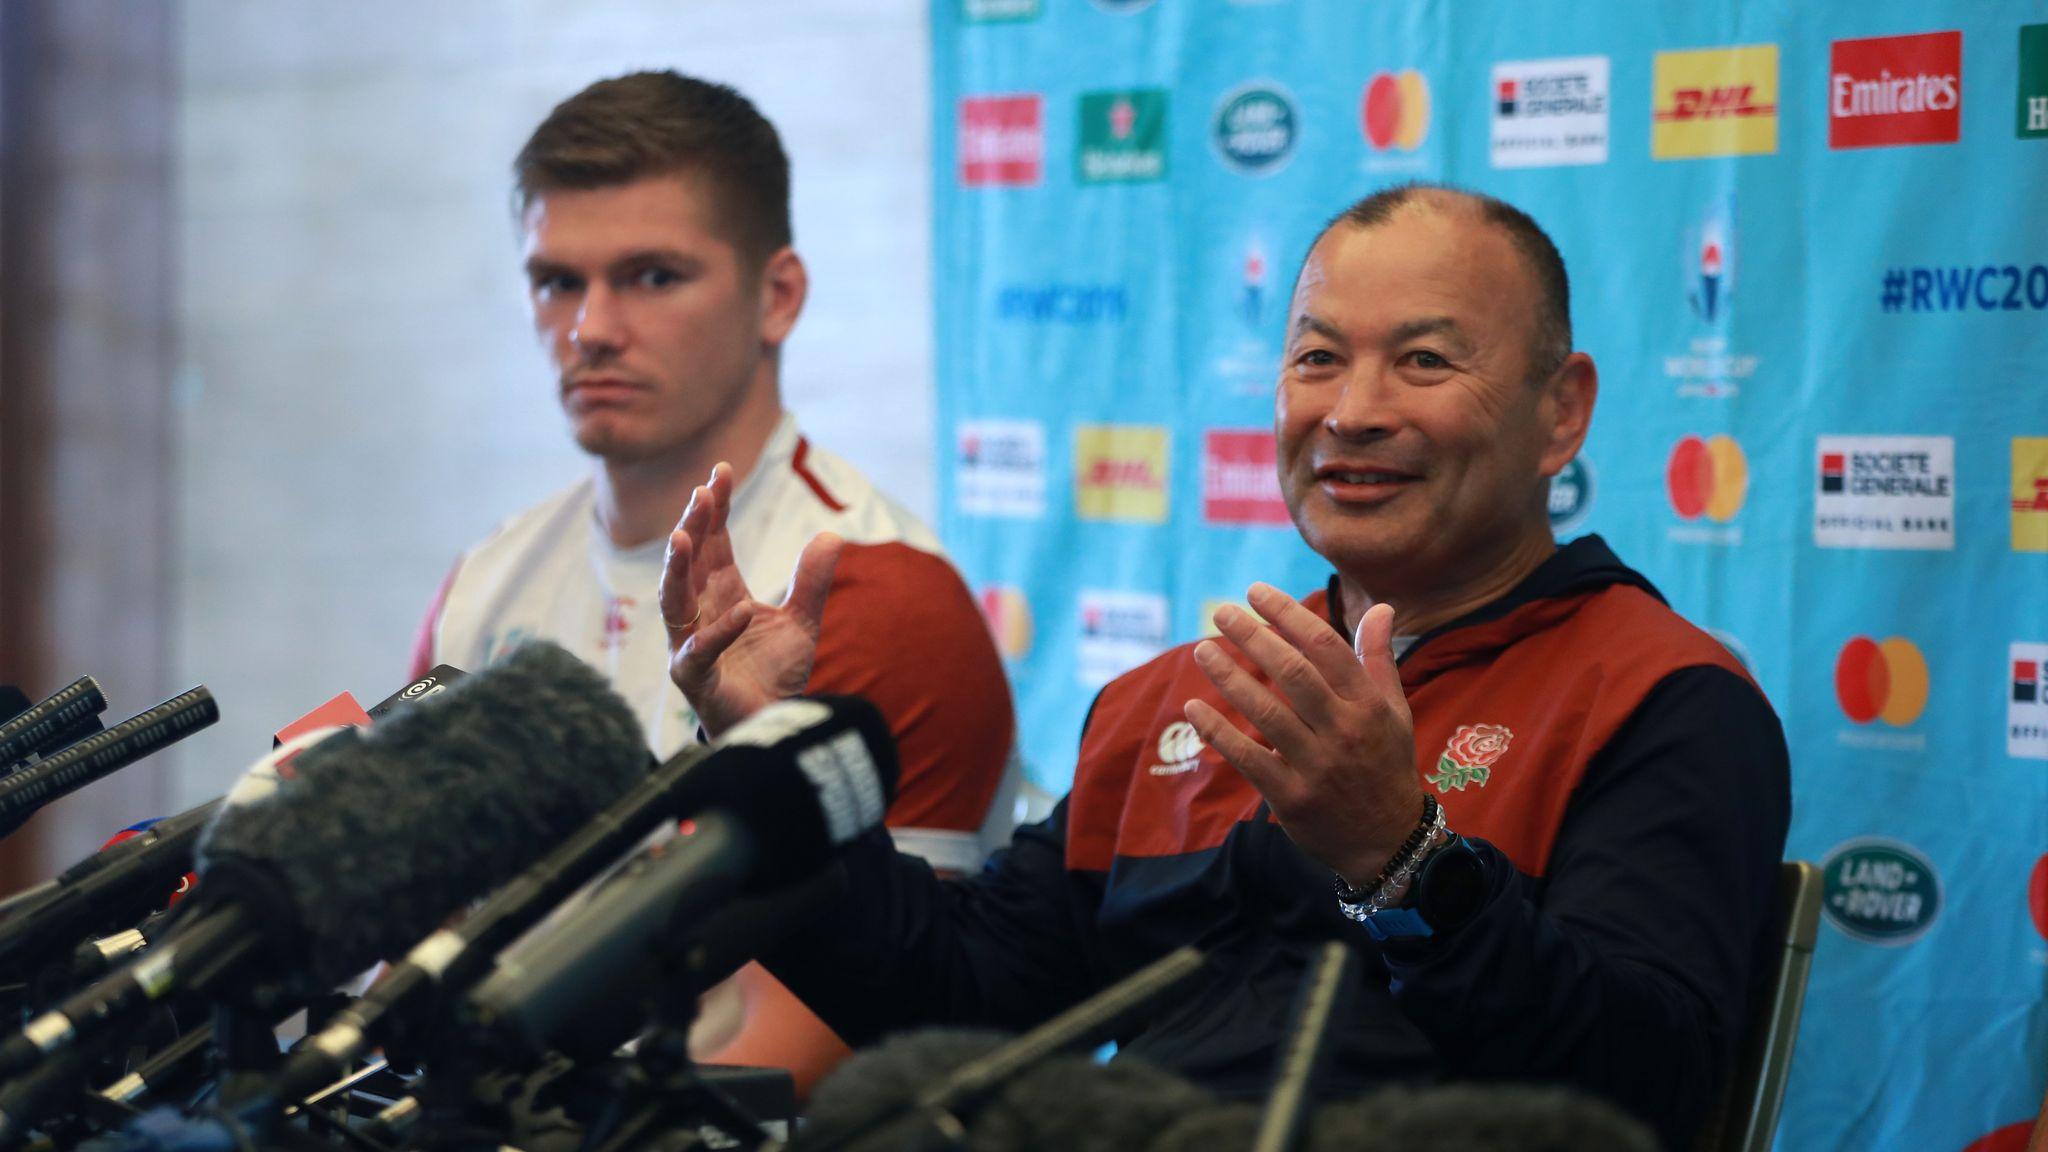 Eddie Jones claims England training was spied on before All Blacks semi-final